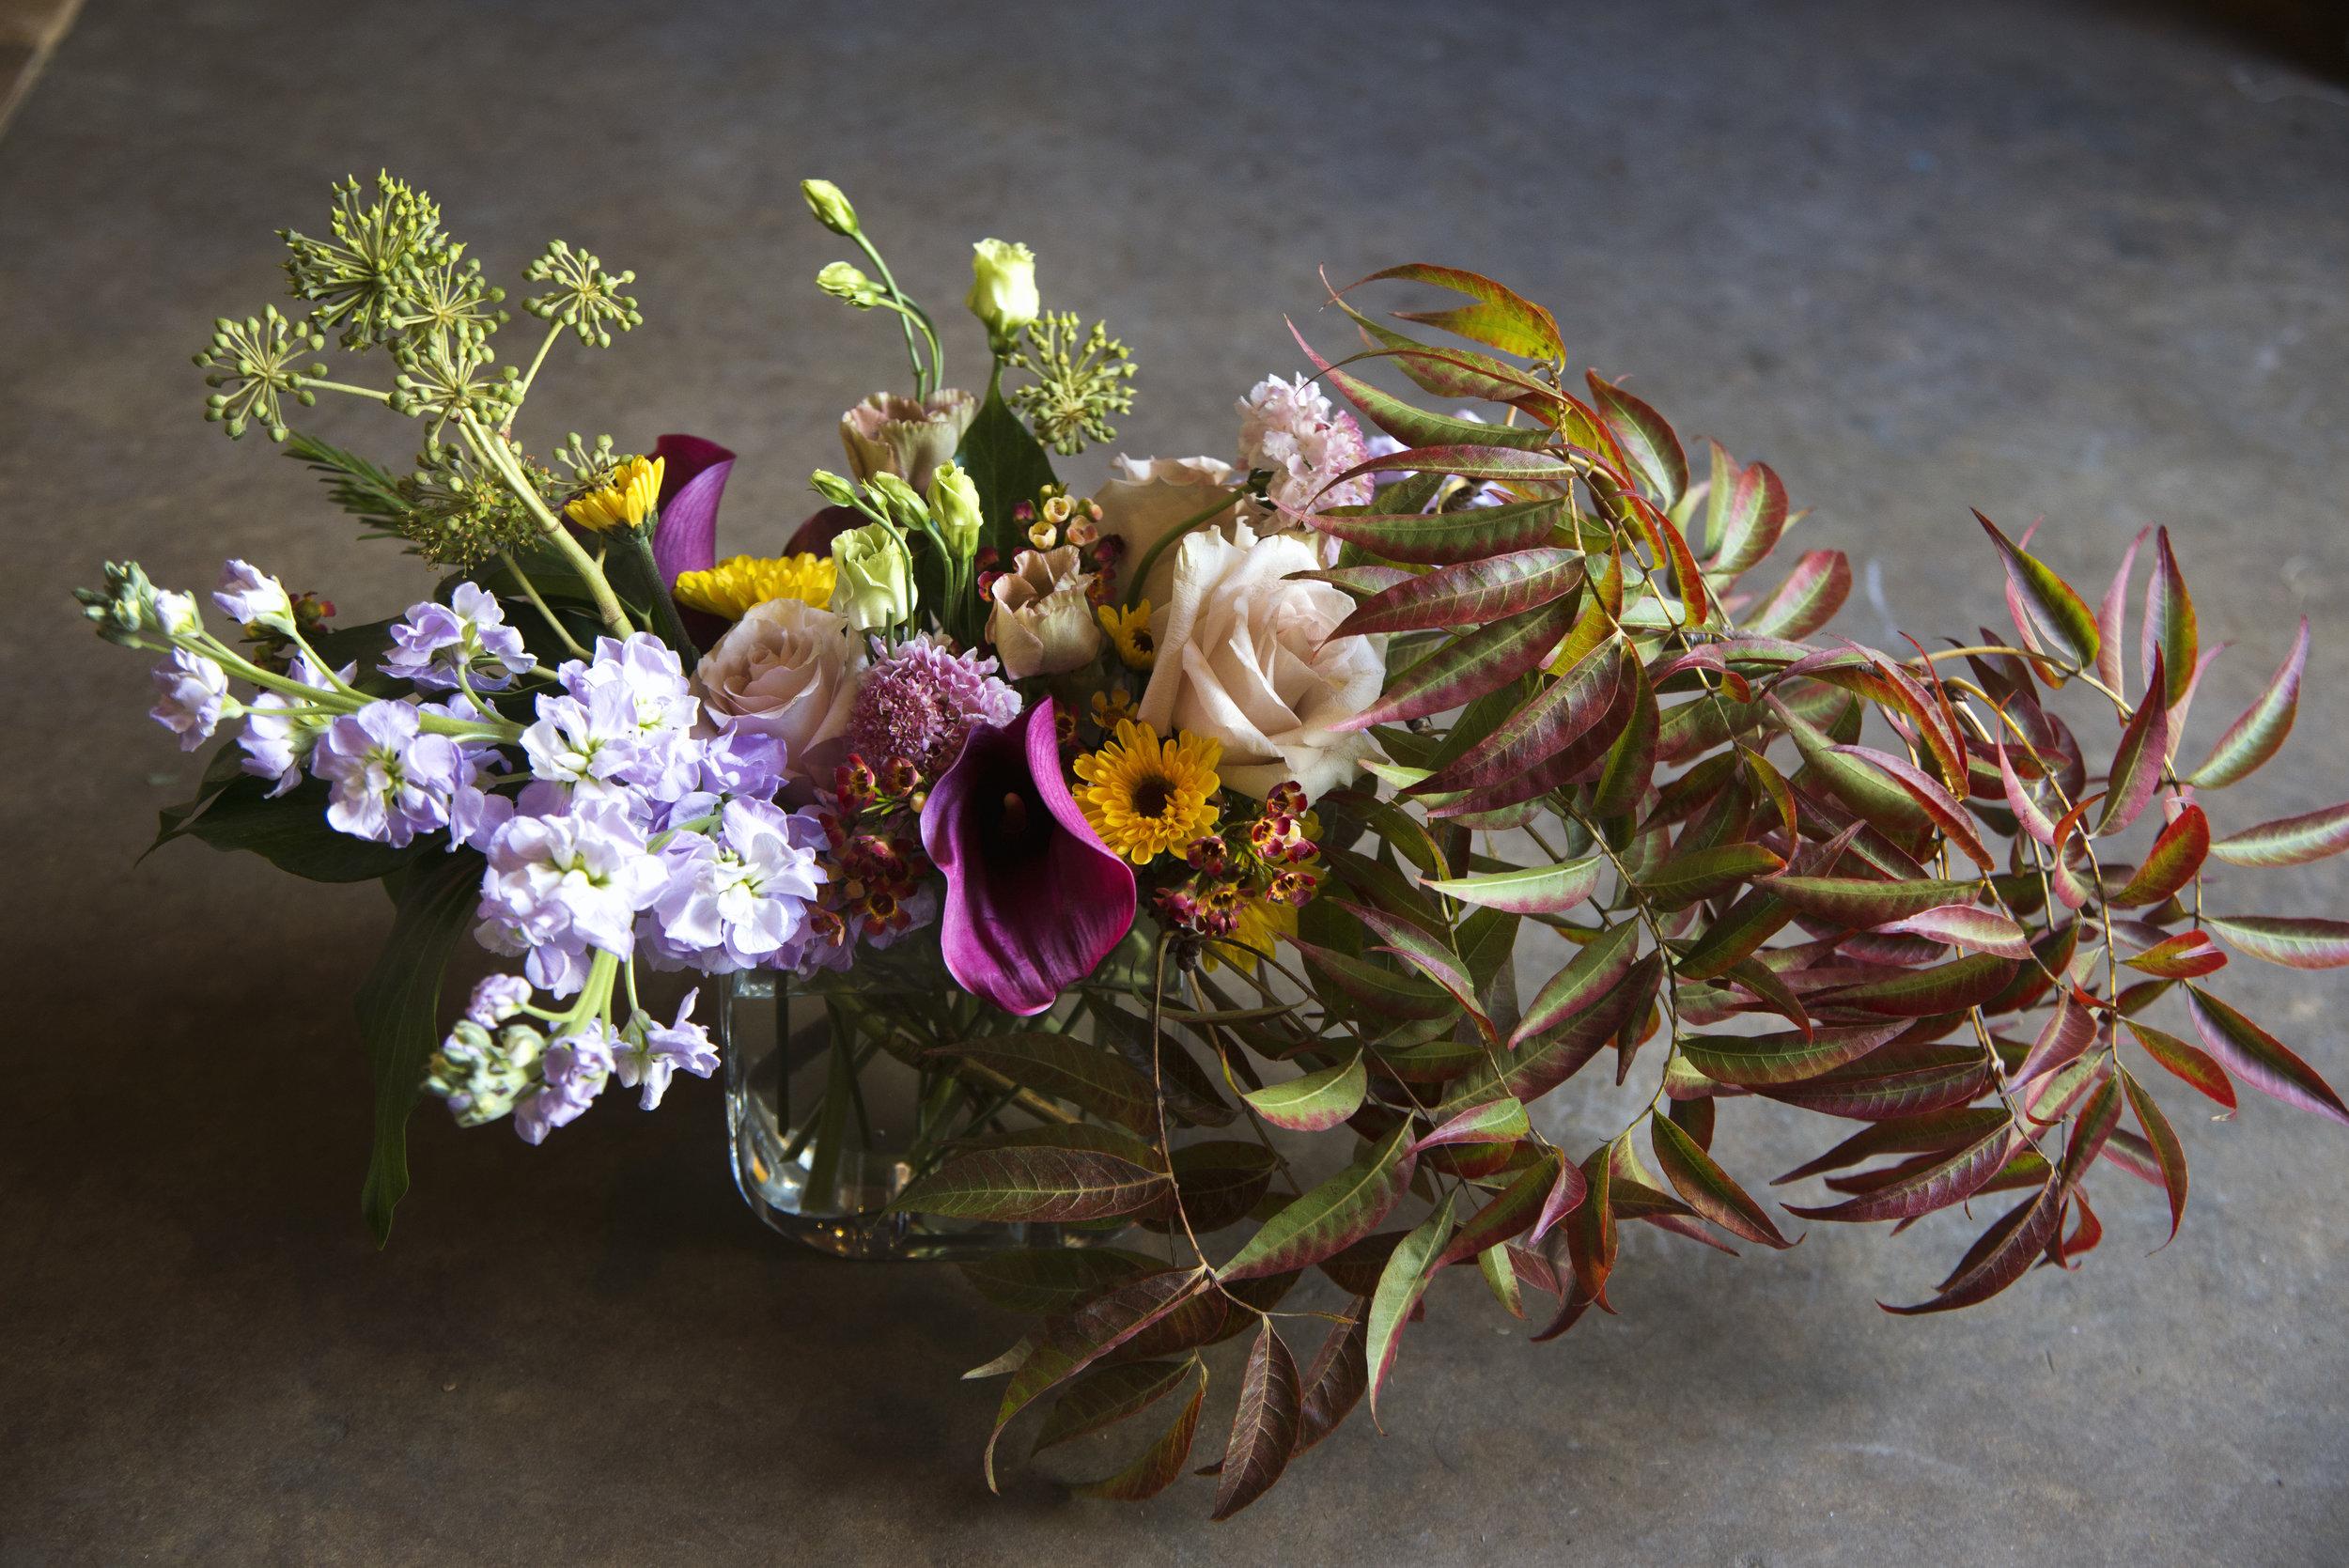 pistachio branch arrangement fall new orleans florist mitchs flowers denys mertz.jpg